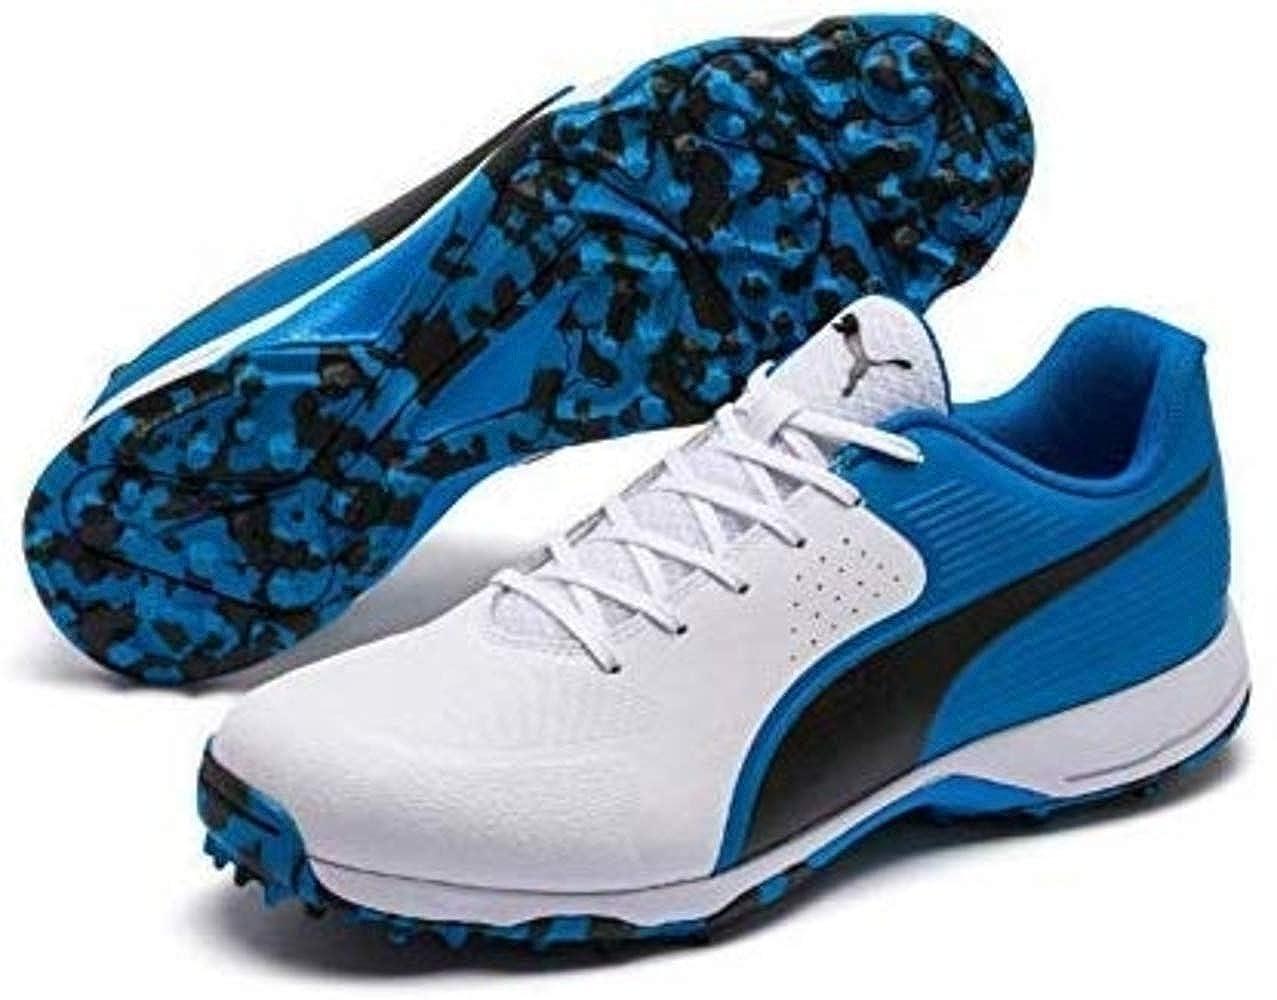 Puma Cricket Shoes Rubber Outsole Virat Kohli One8 Edition Cricket Shoes